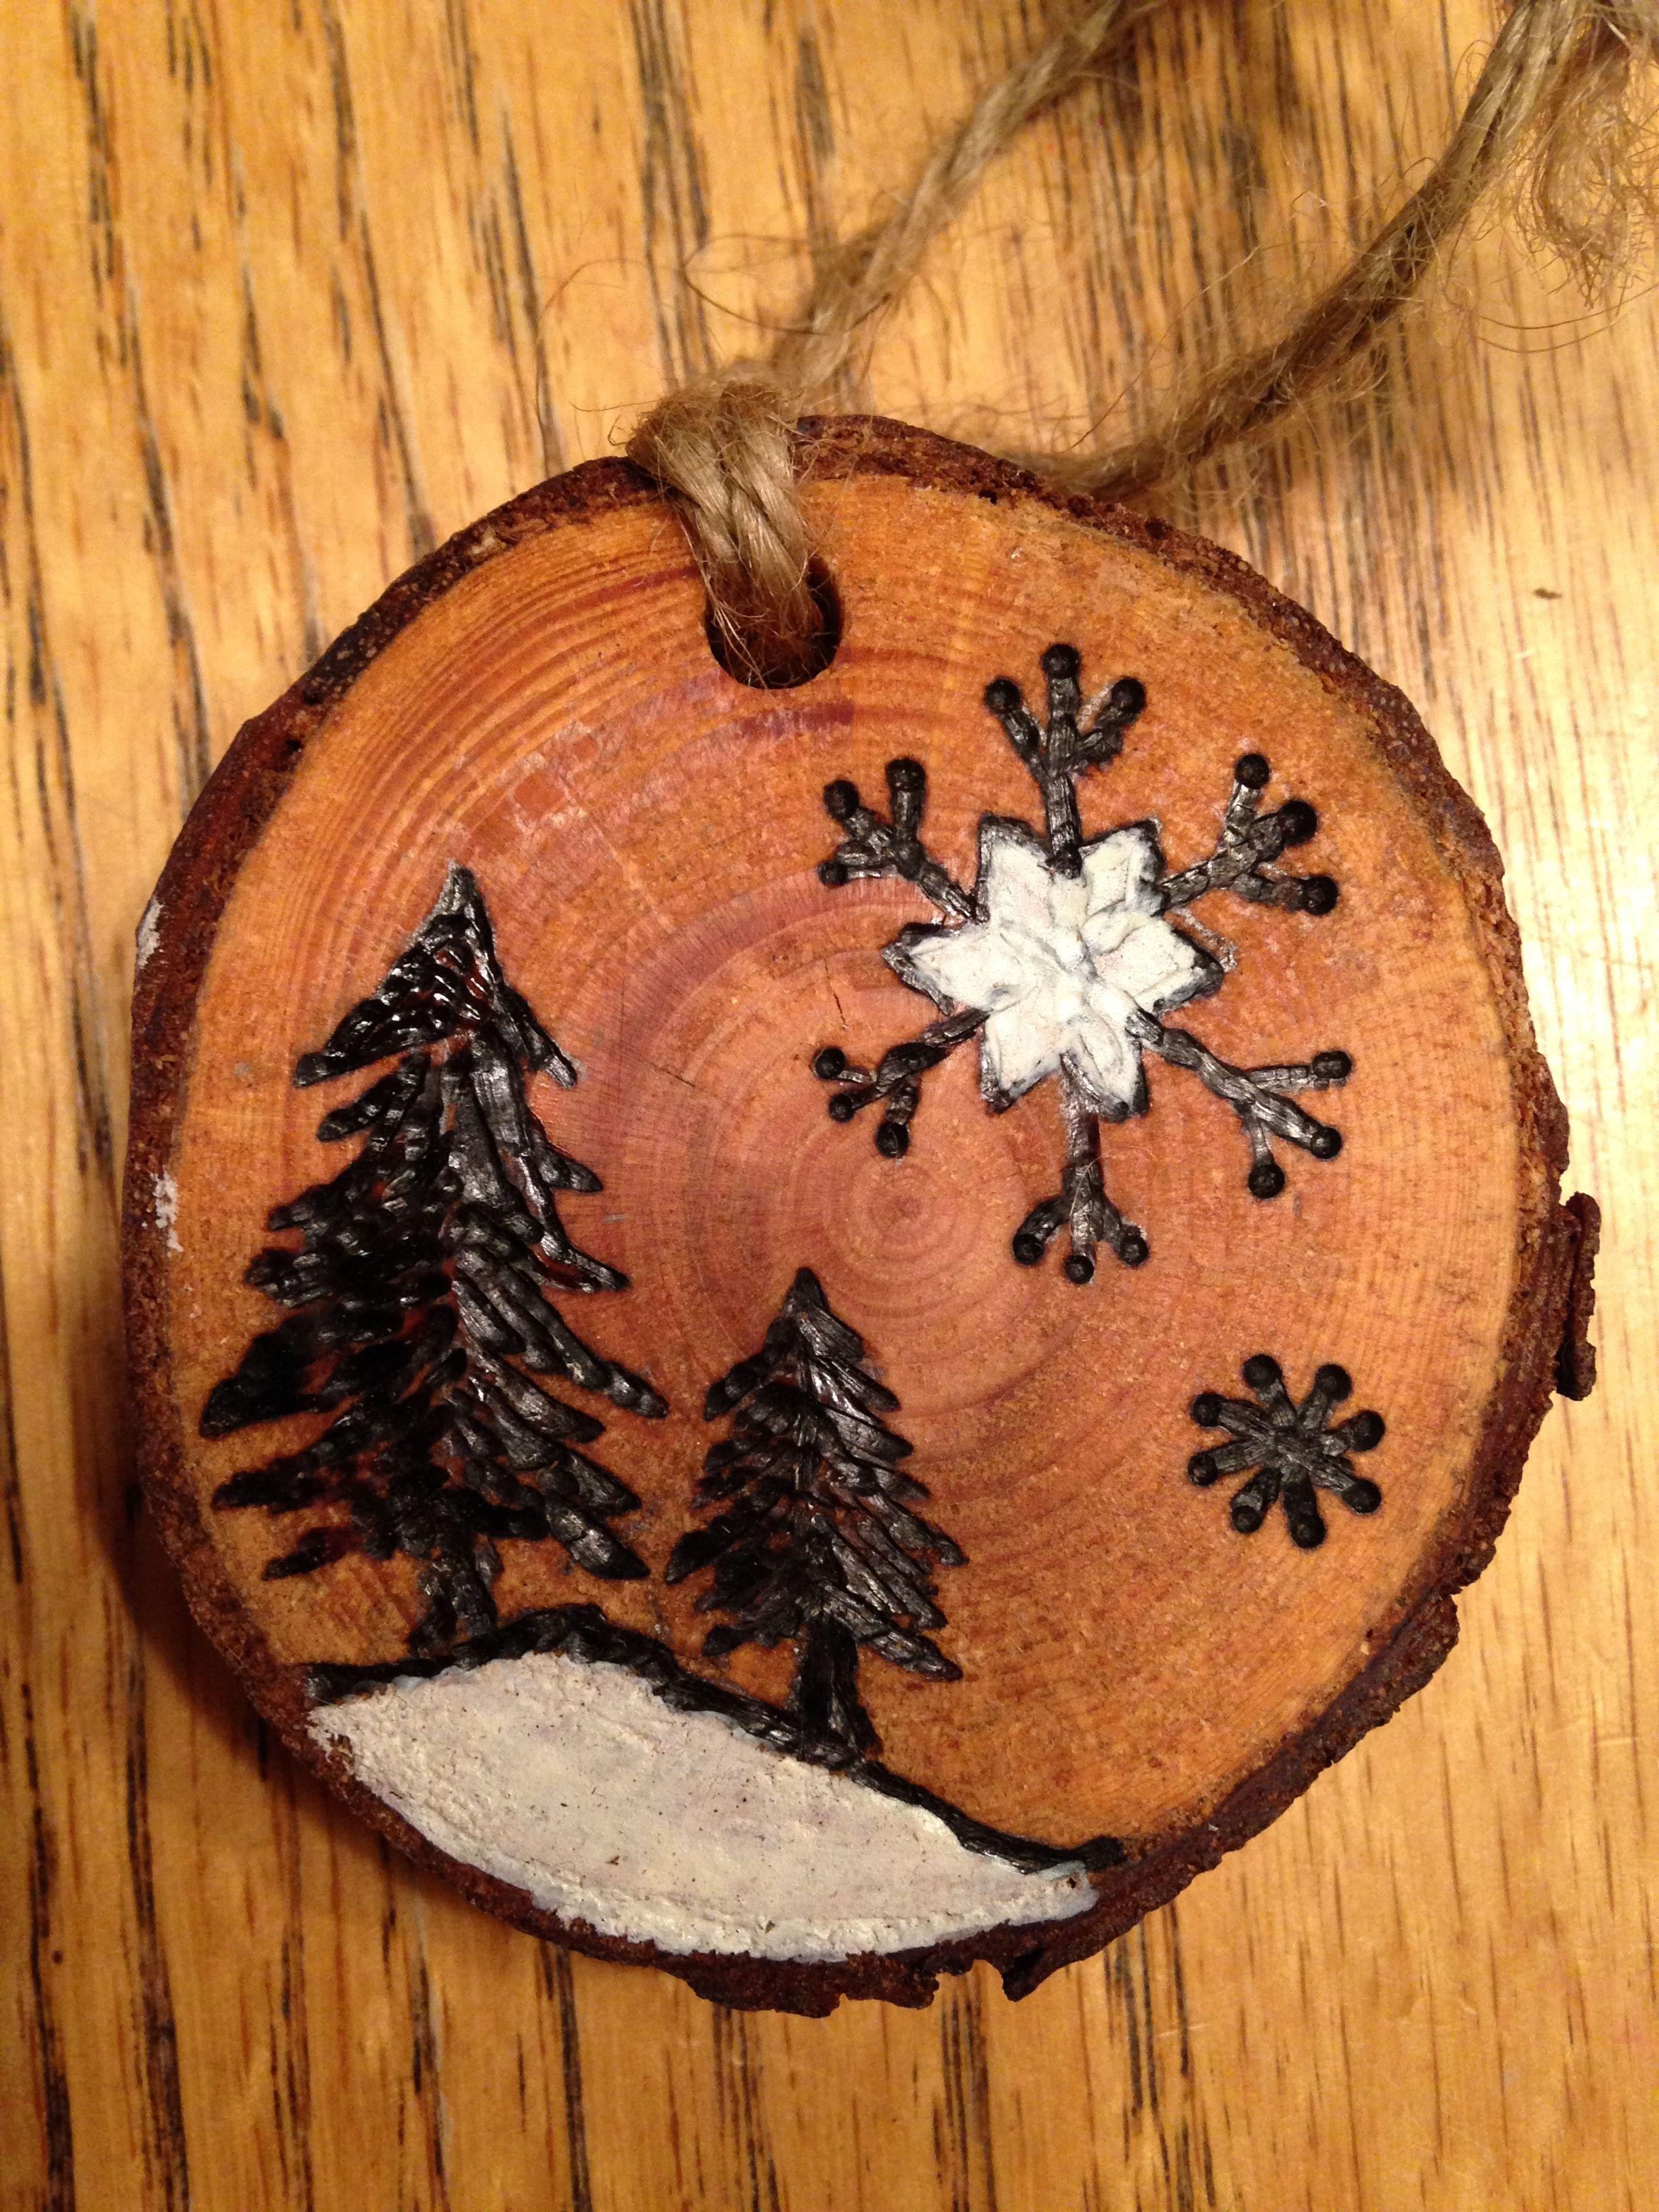 Rustic Wood Burned Christmas Ornament Natural Wood With Images Wood Christmas Ornaments Christmas Ornaments Homemade Christmas Wood